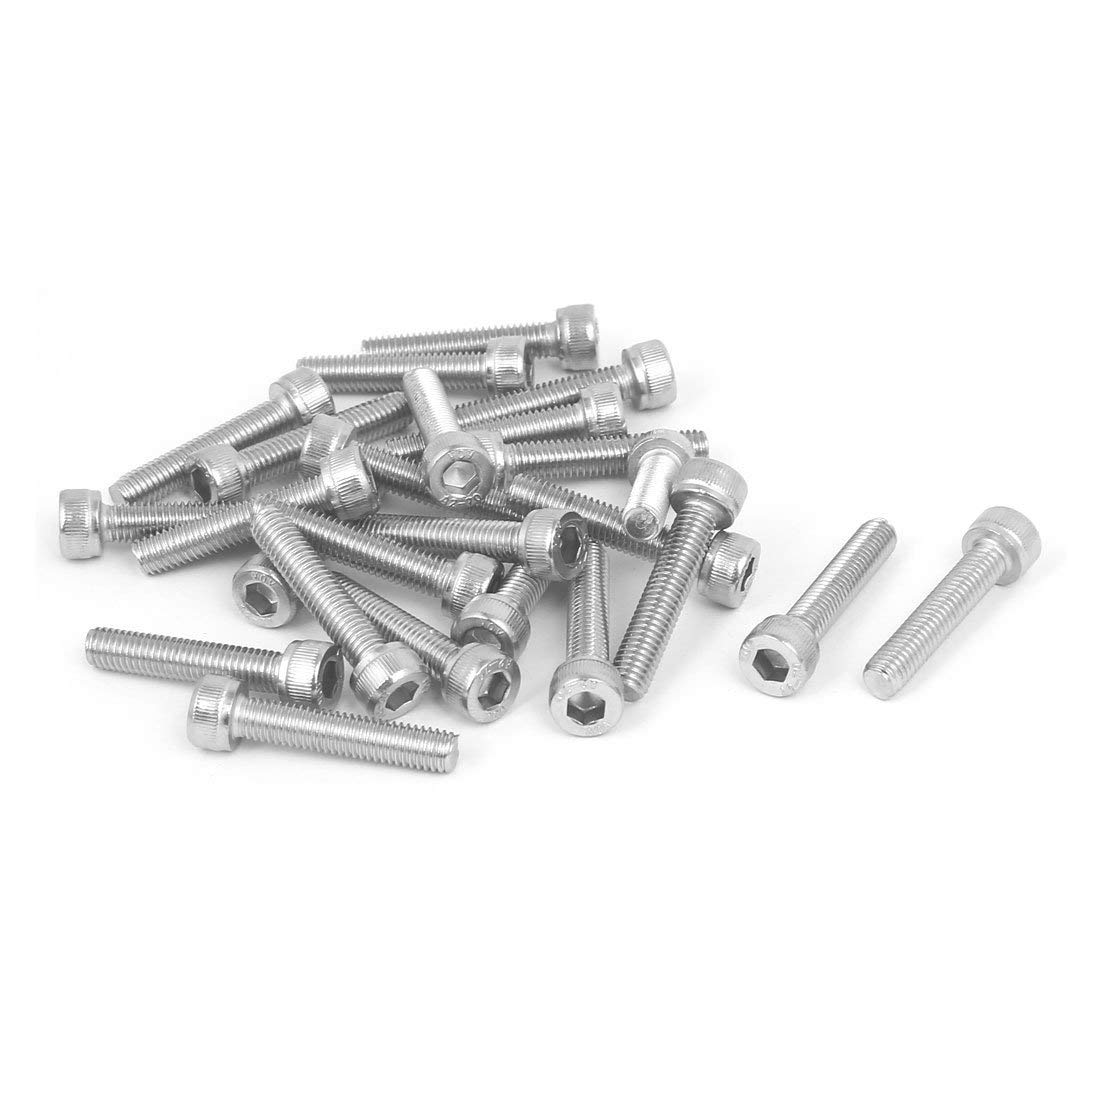 uxcell M3x35mm Thread 304 Stainless Steel Hex Socket Head Cap Screw Bolt DIN912 55pcs